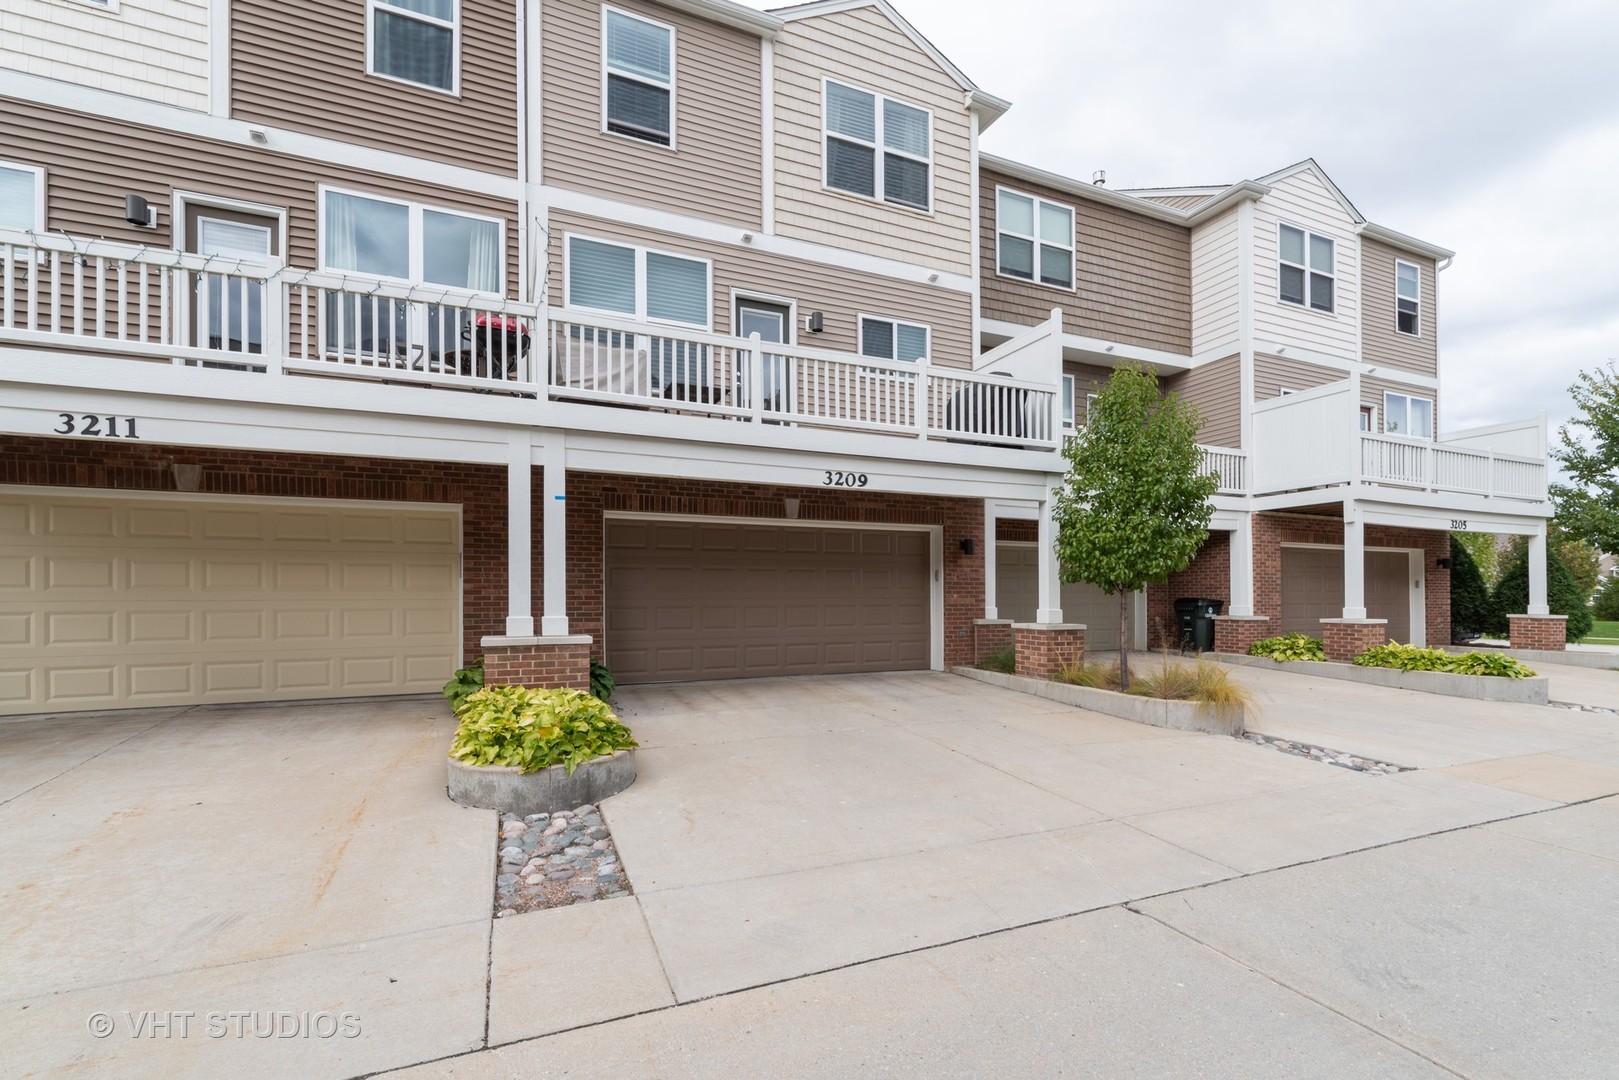 3209 Coral, Glenview, Illinois, 60026